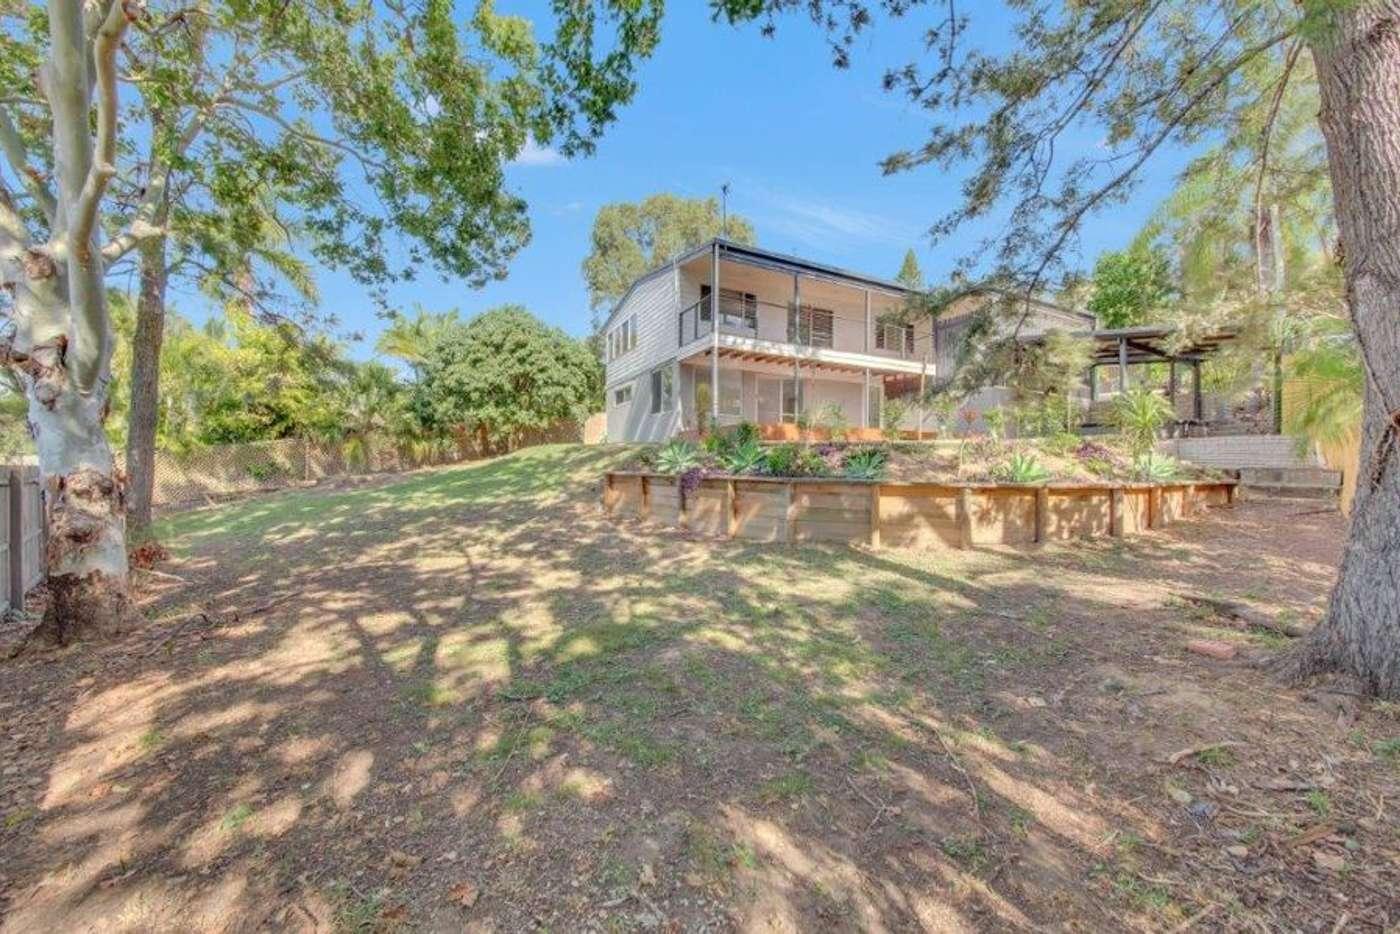 Main view of Homely house listing, 15 Tasman Court, Boyne Island QLD 4680